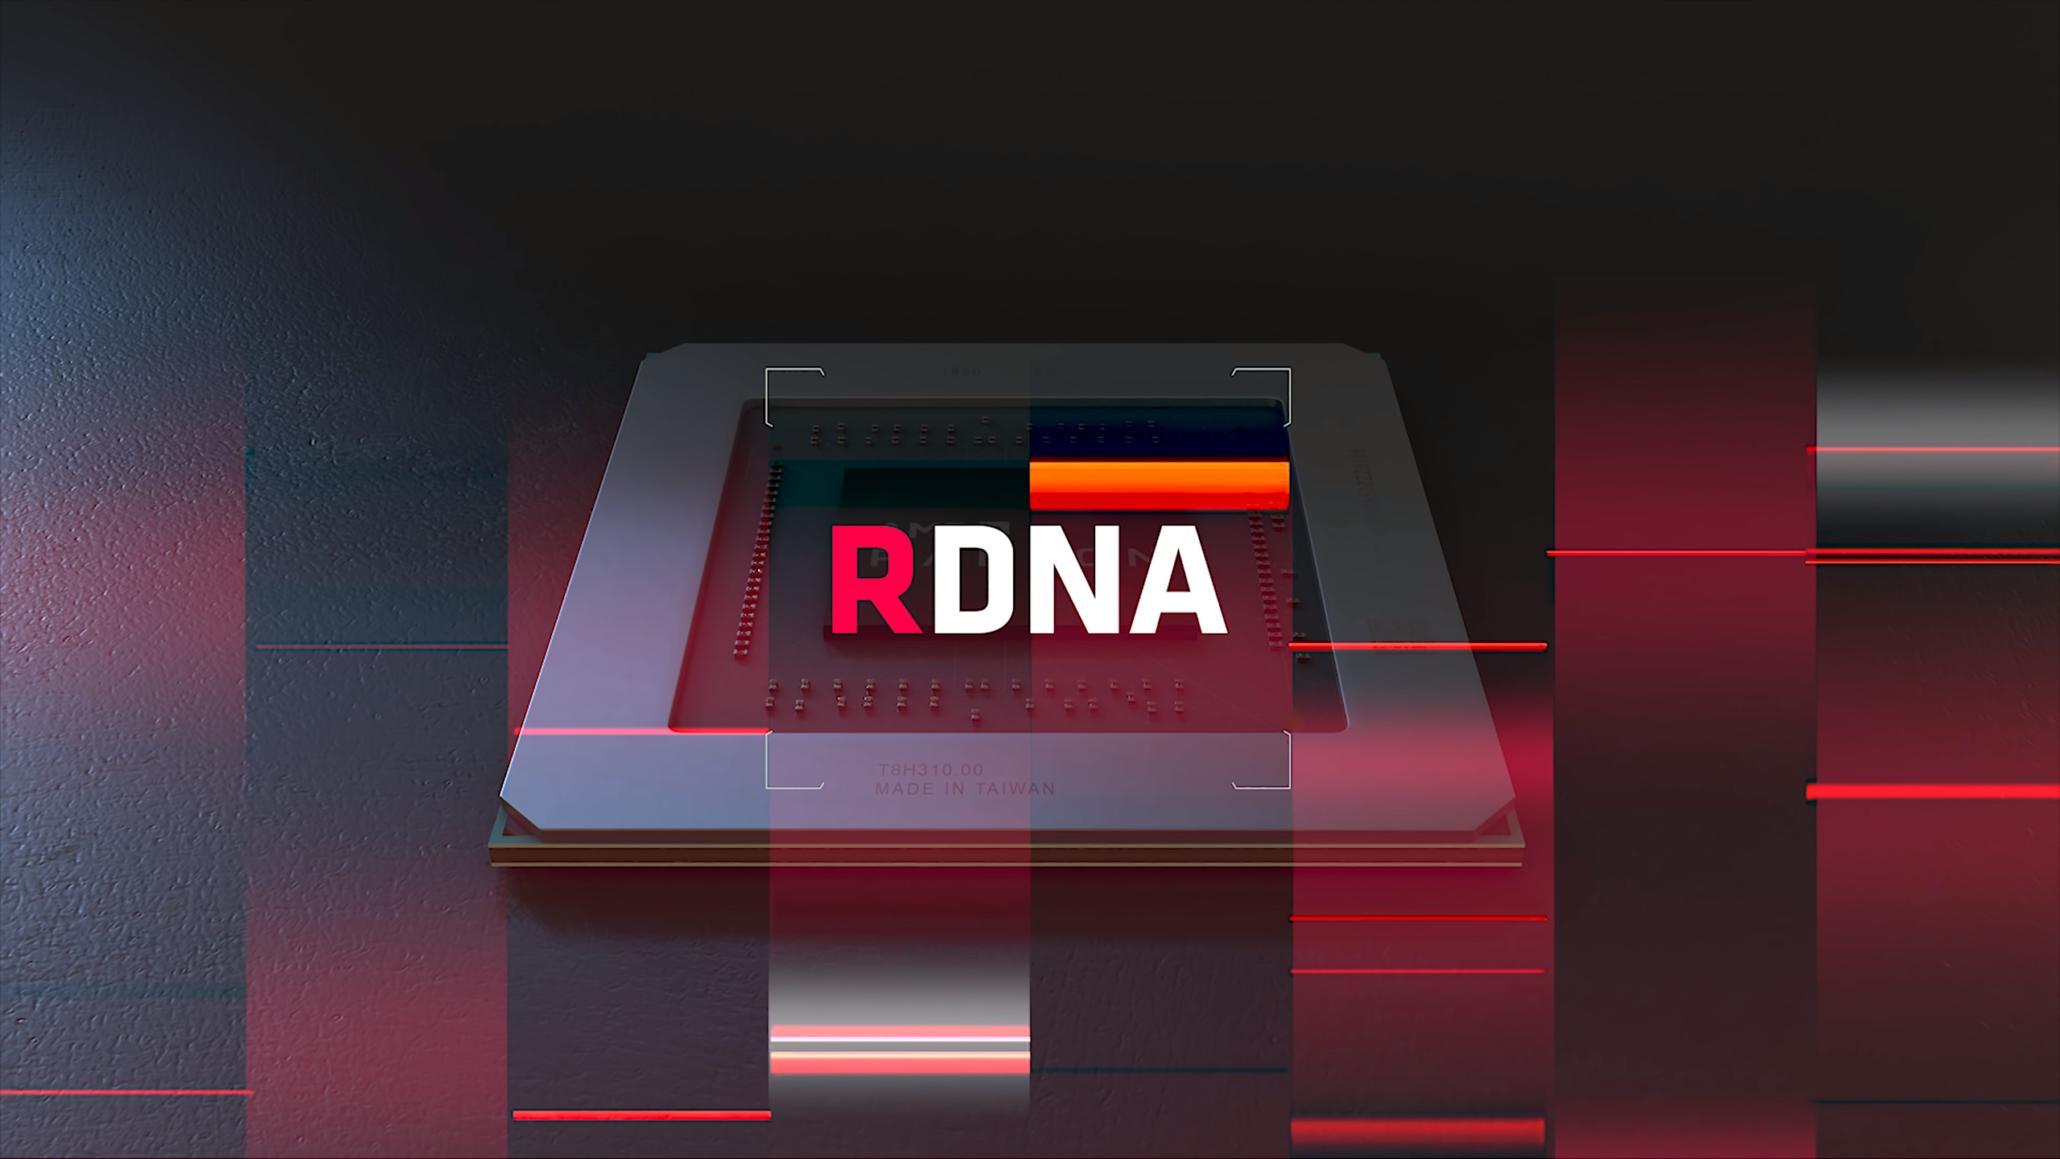 AMD-Radeon-RX-5700_Navi-GPU_7nm-RDNA